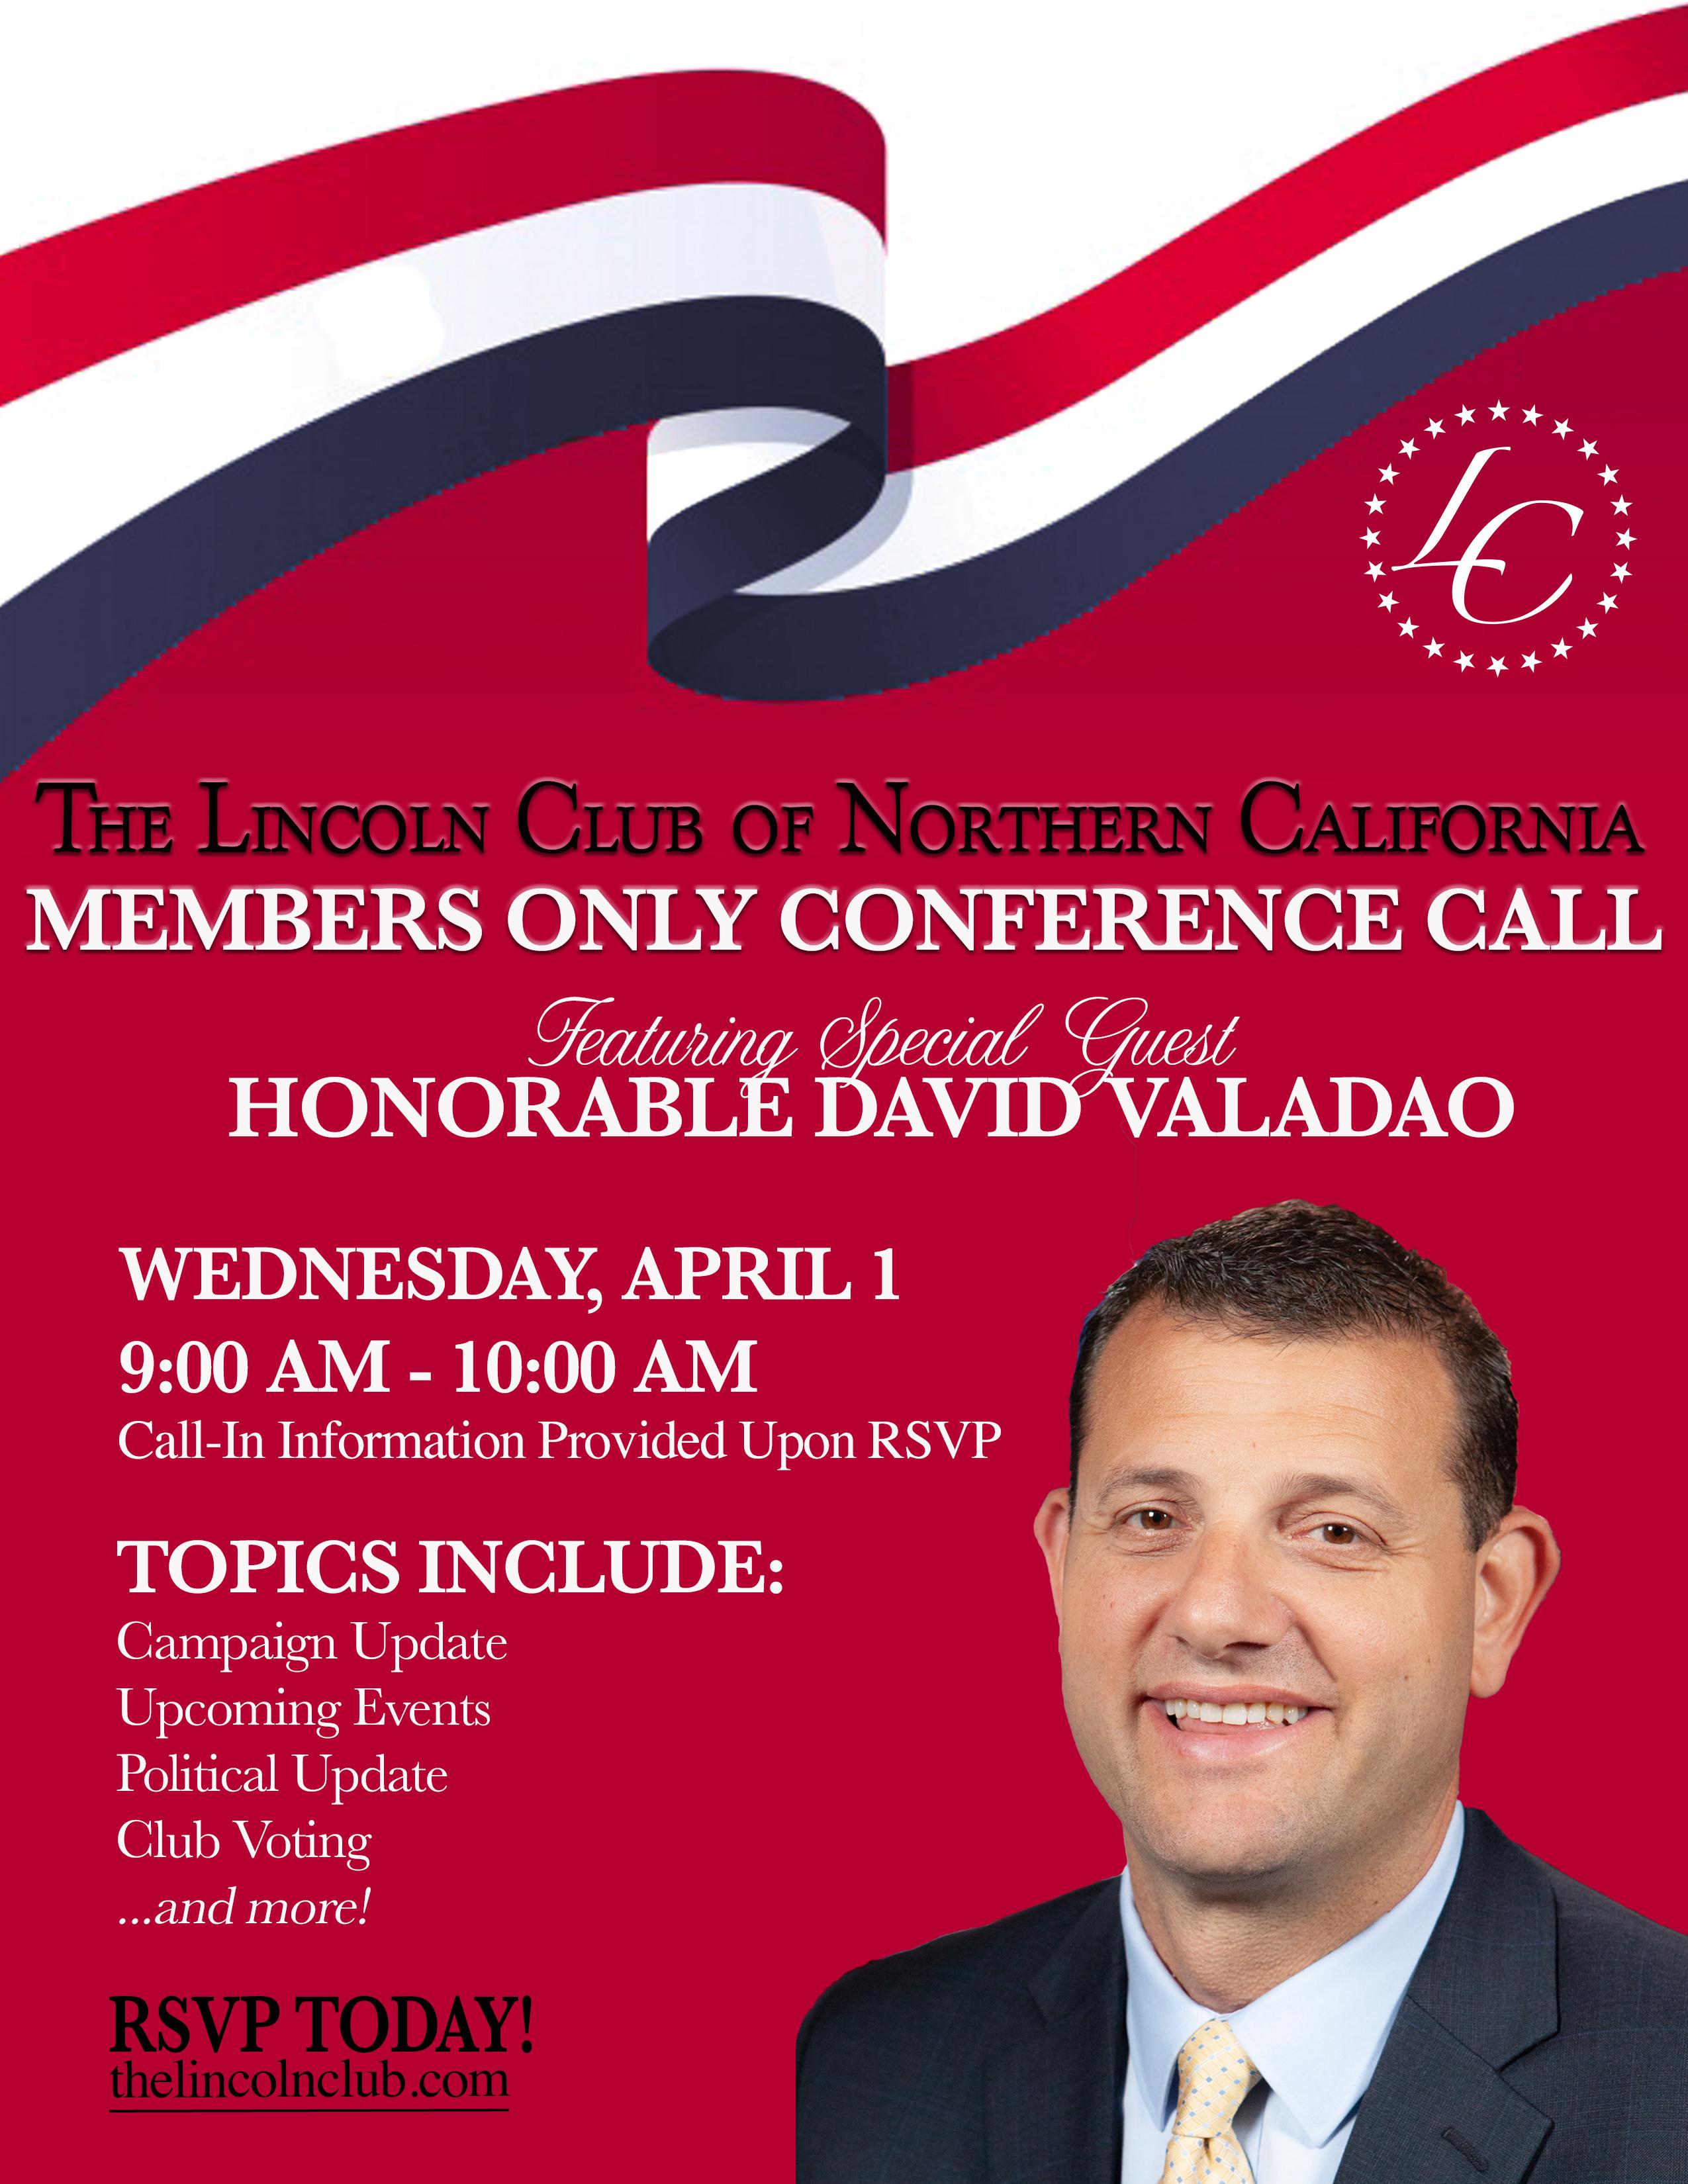 Conference_Call_VALADAO_FINAL.jpg